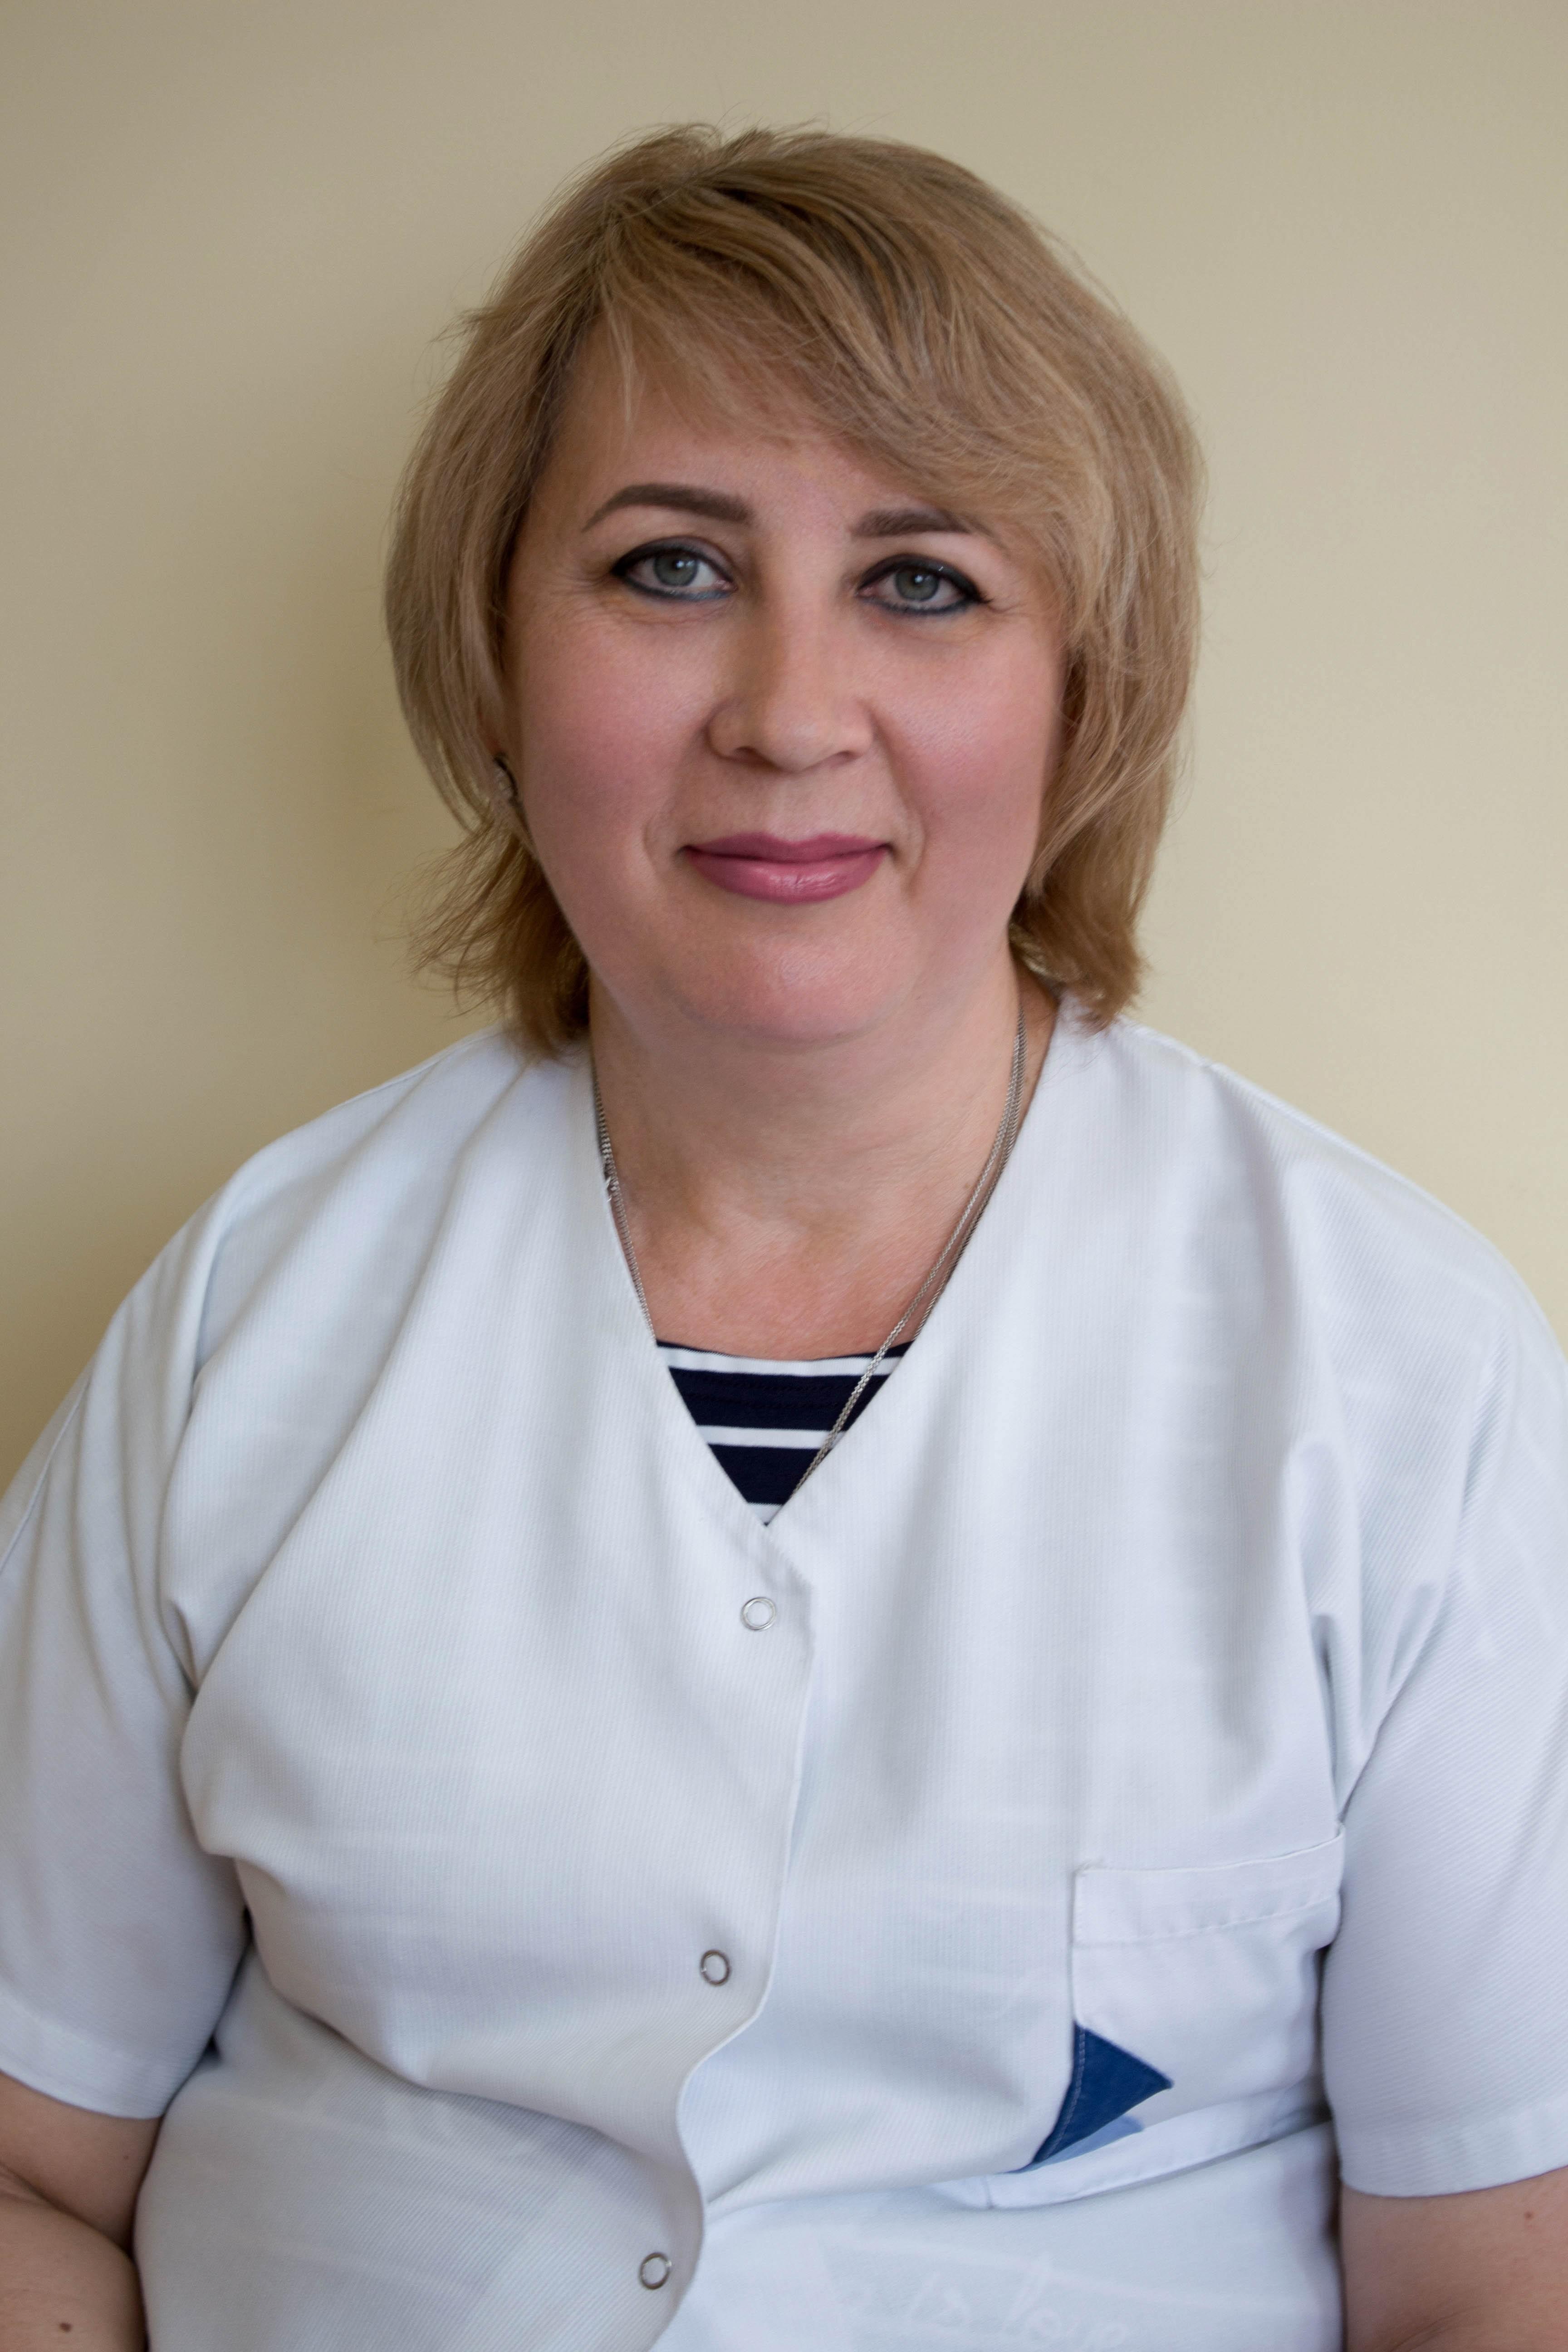 Белых Ирина Юрьевна - врач хирург, эндоскопист